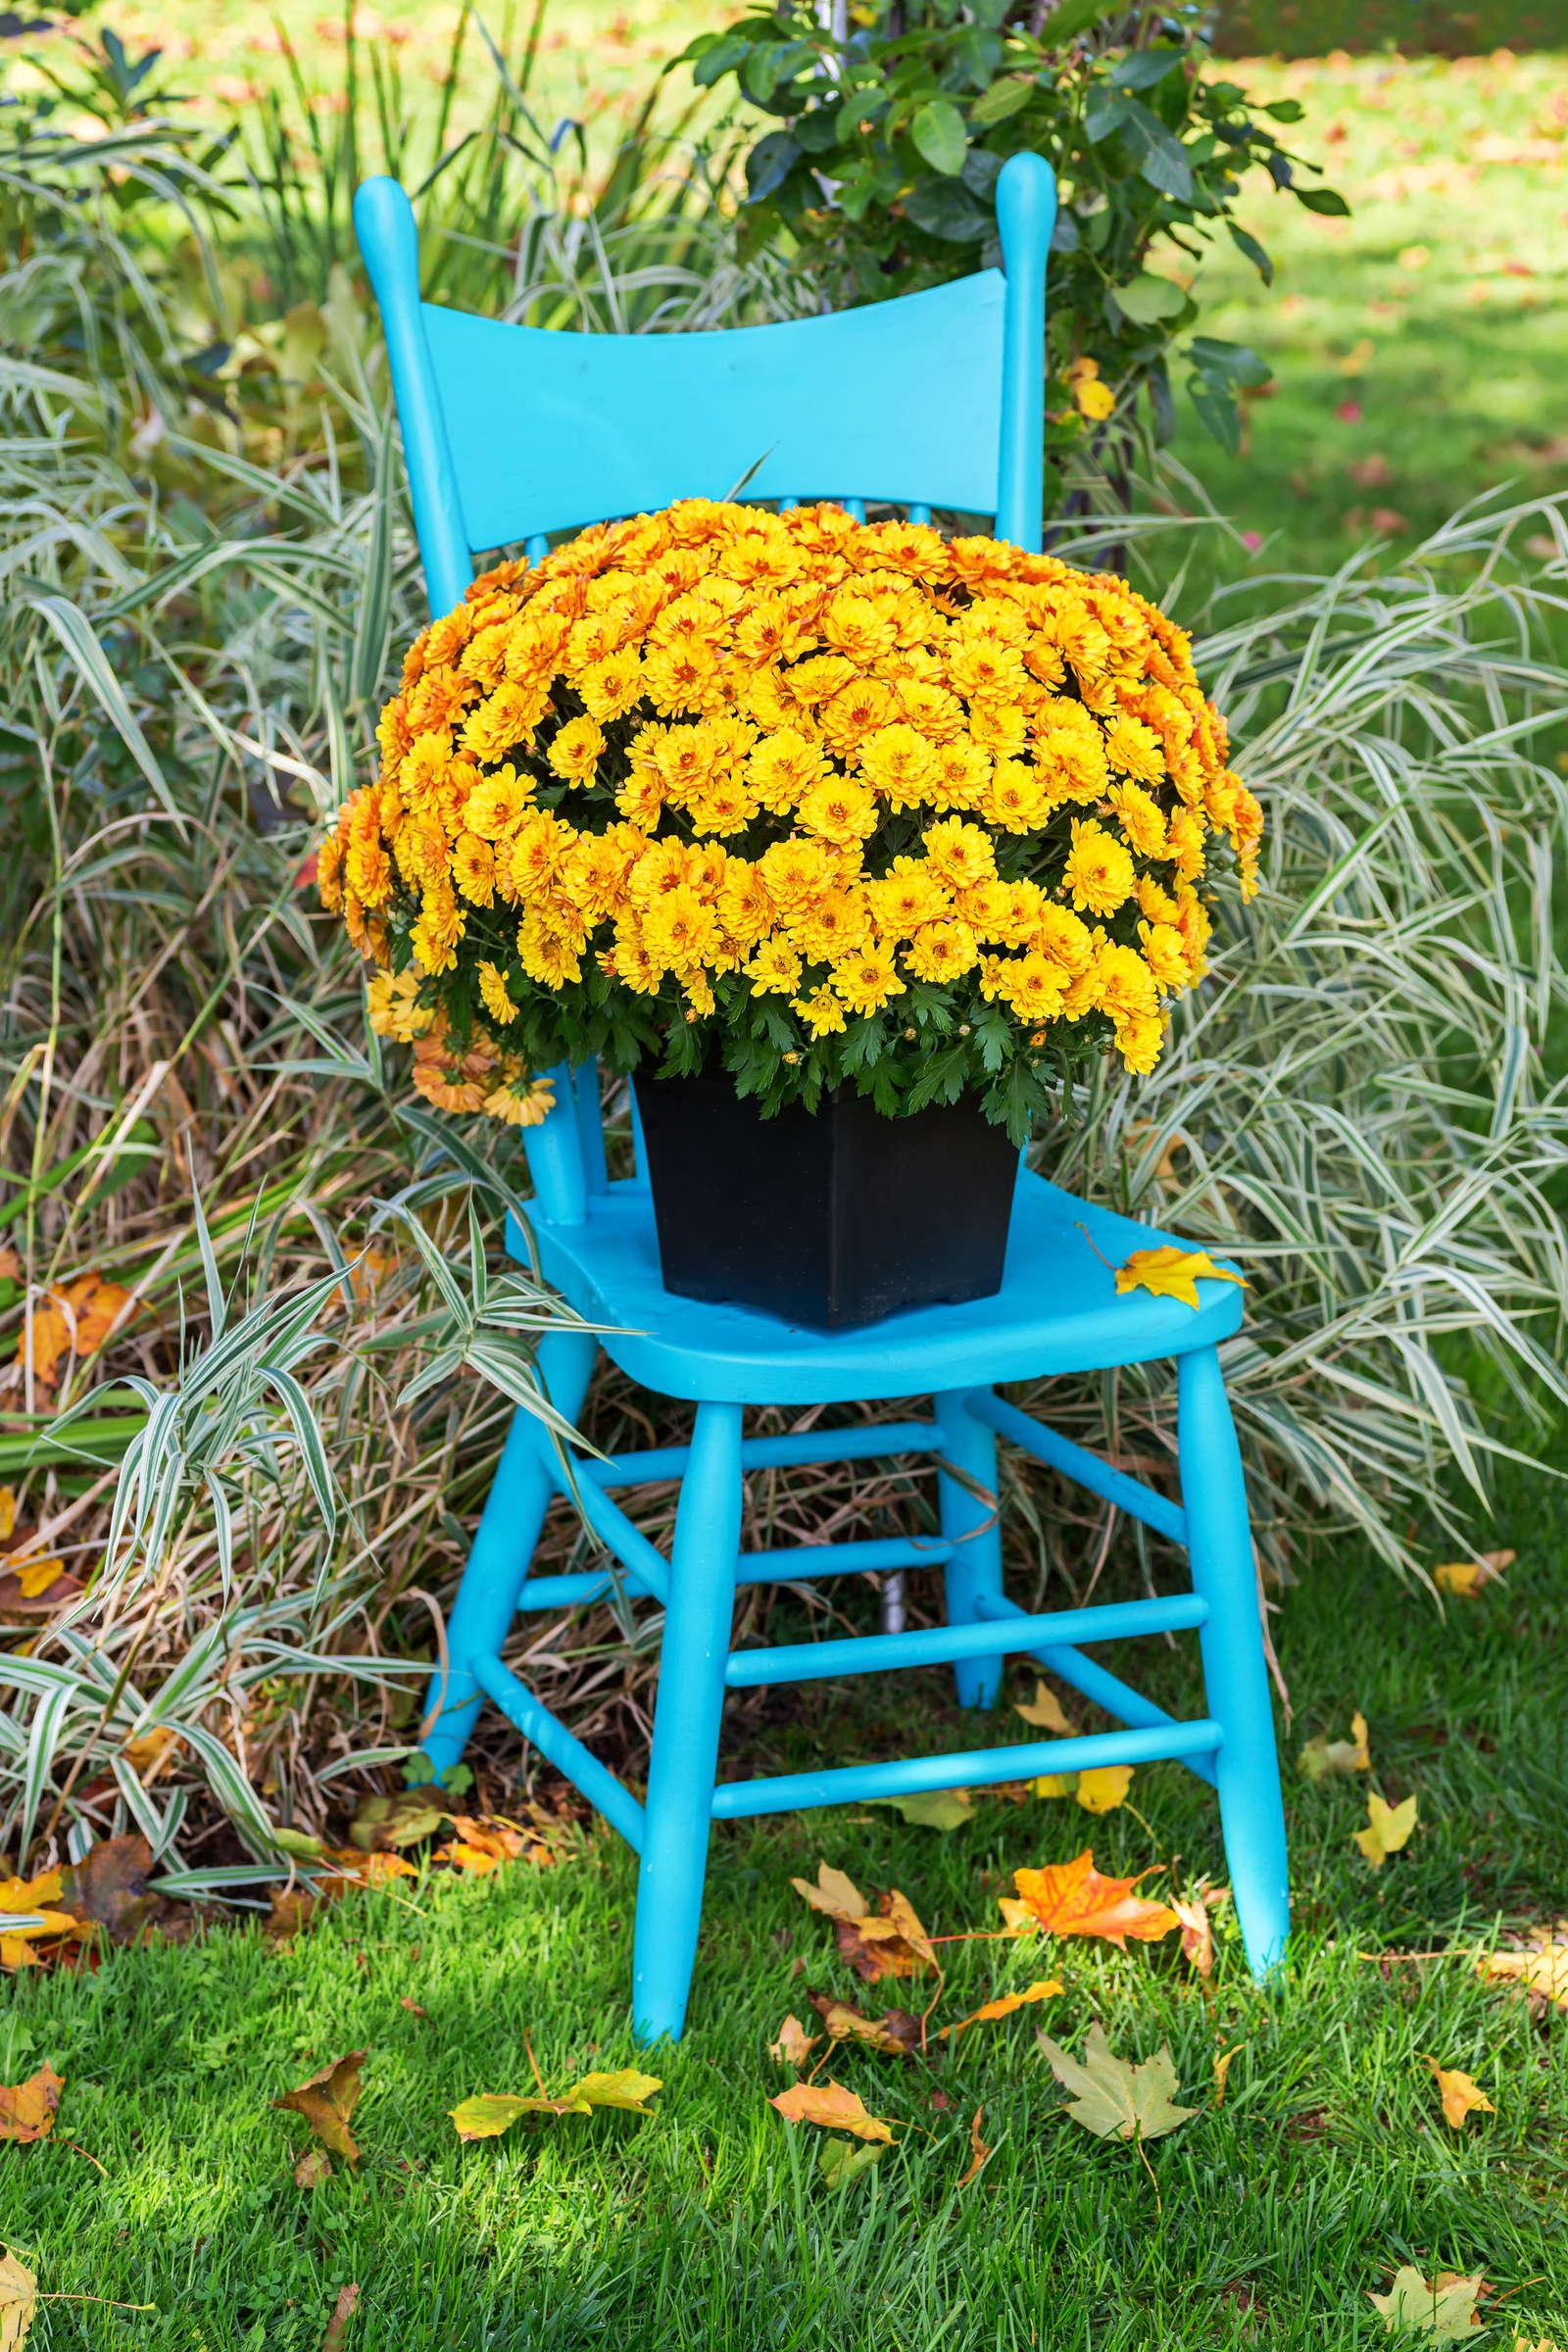 chrysanthemen experten wissen pflege tipps plantura. Black Bedroom Furniture Sets. Home Design Ideas